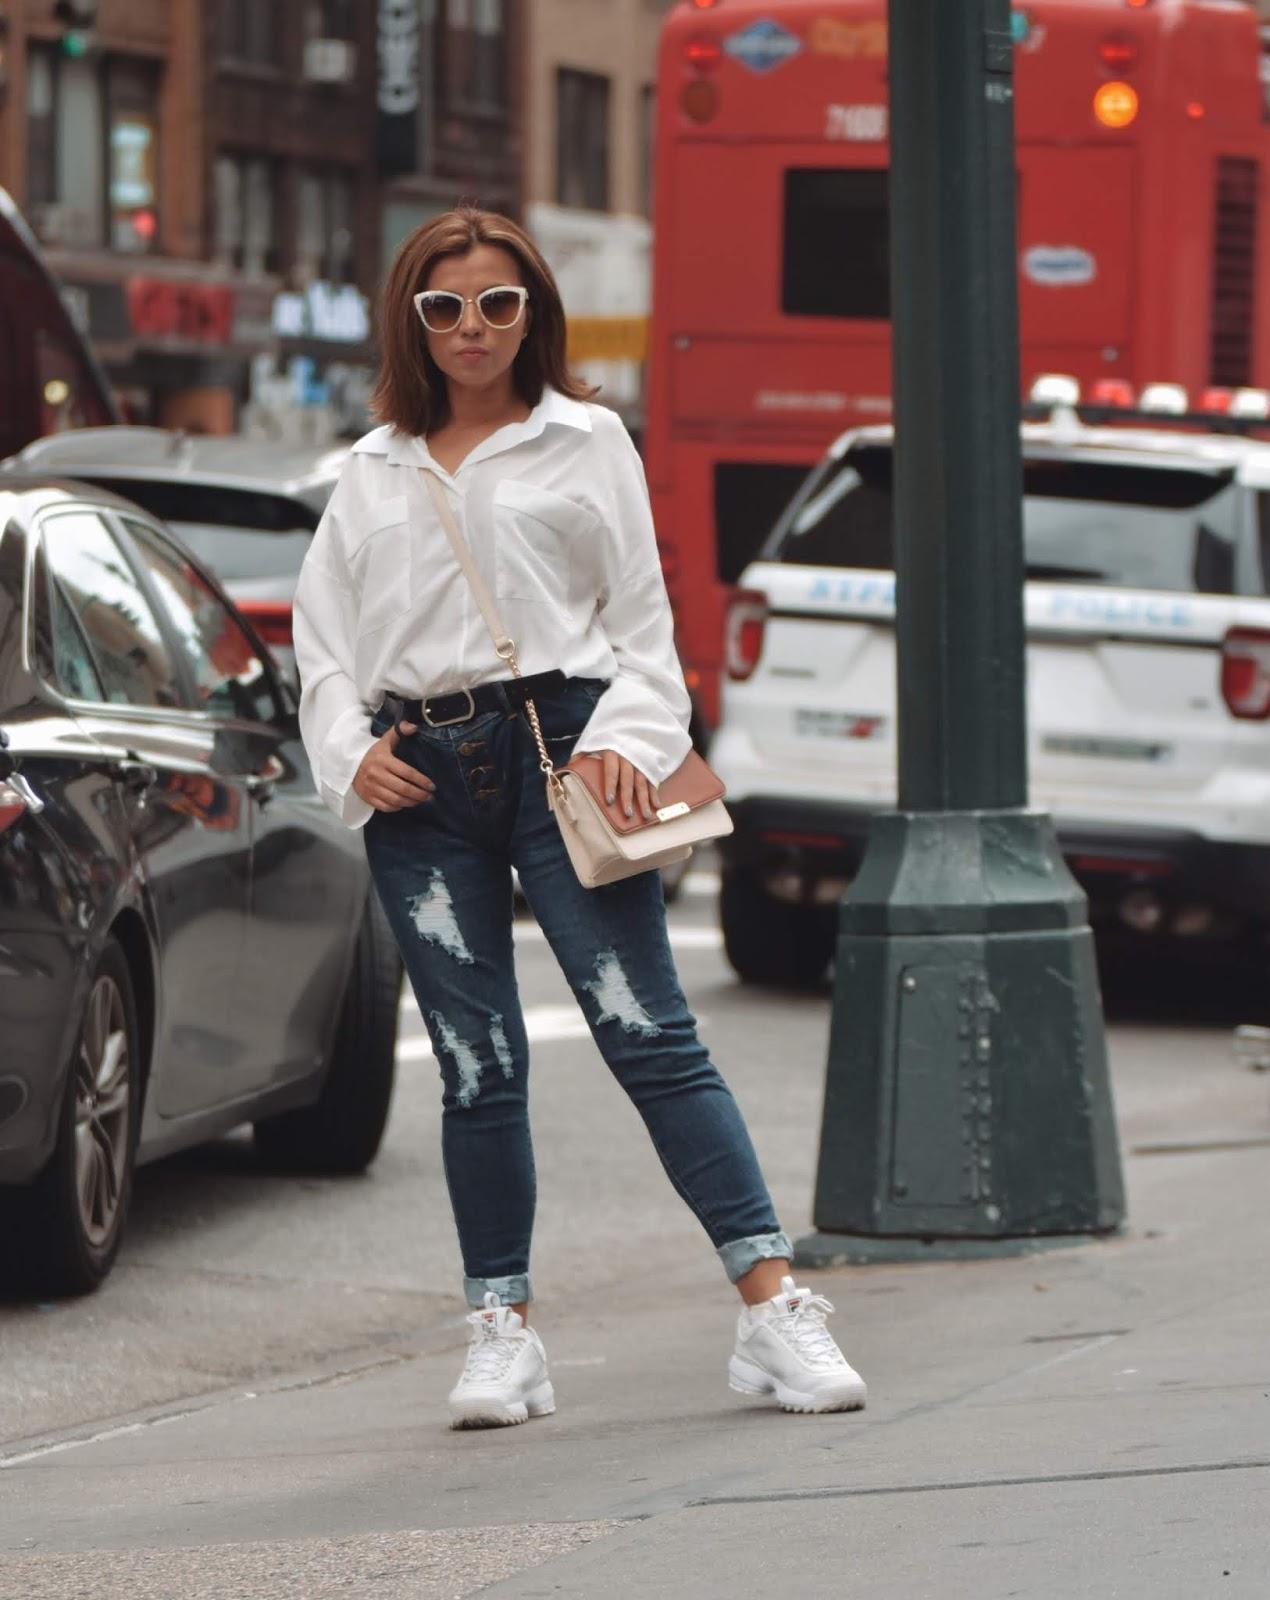 White Long Sleeves Lapel Collar High-Low Loose Top-mariestilo-lookbookstore-